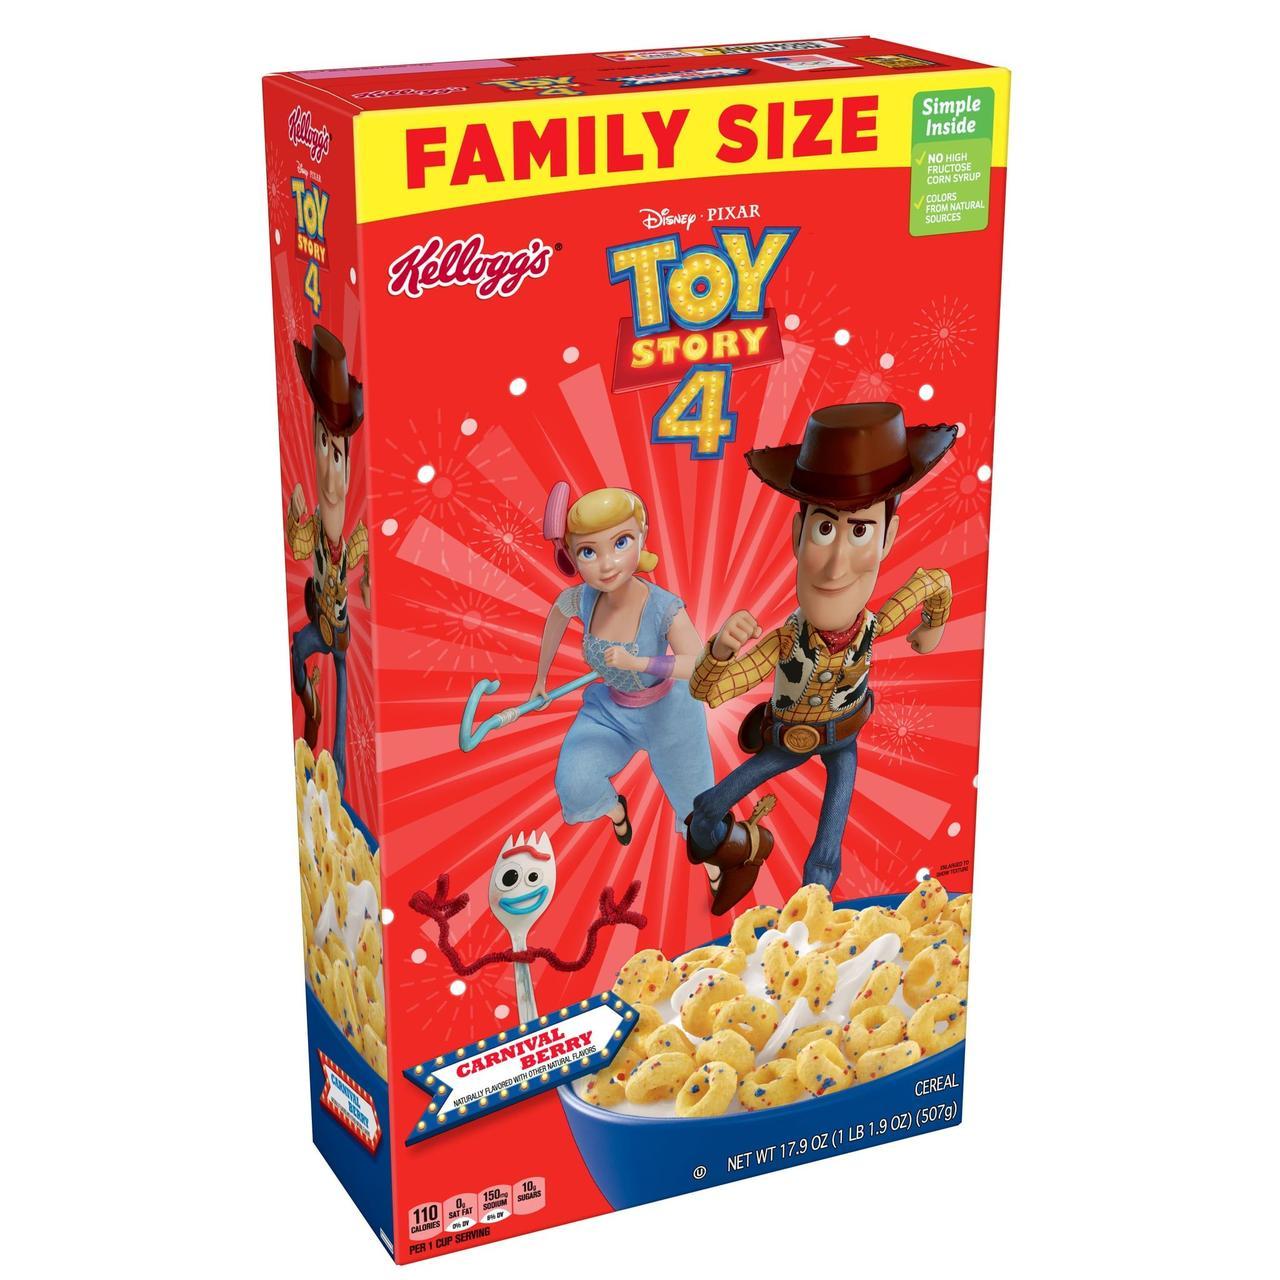 Kellogg's Toy Story 507 g